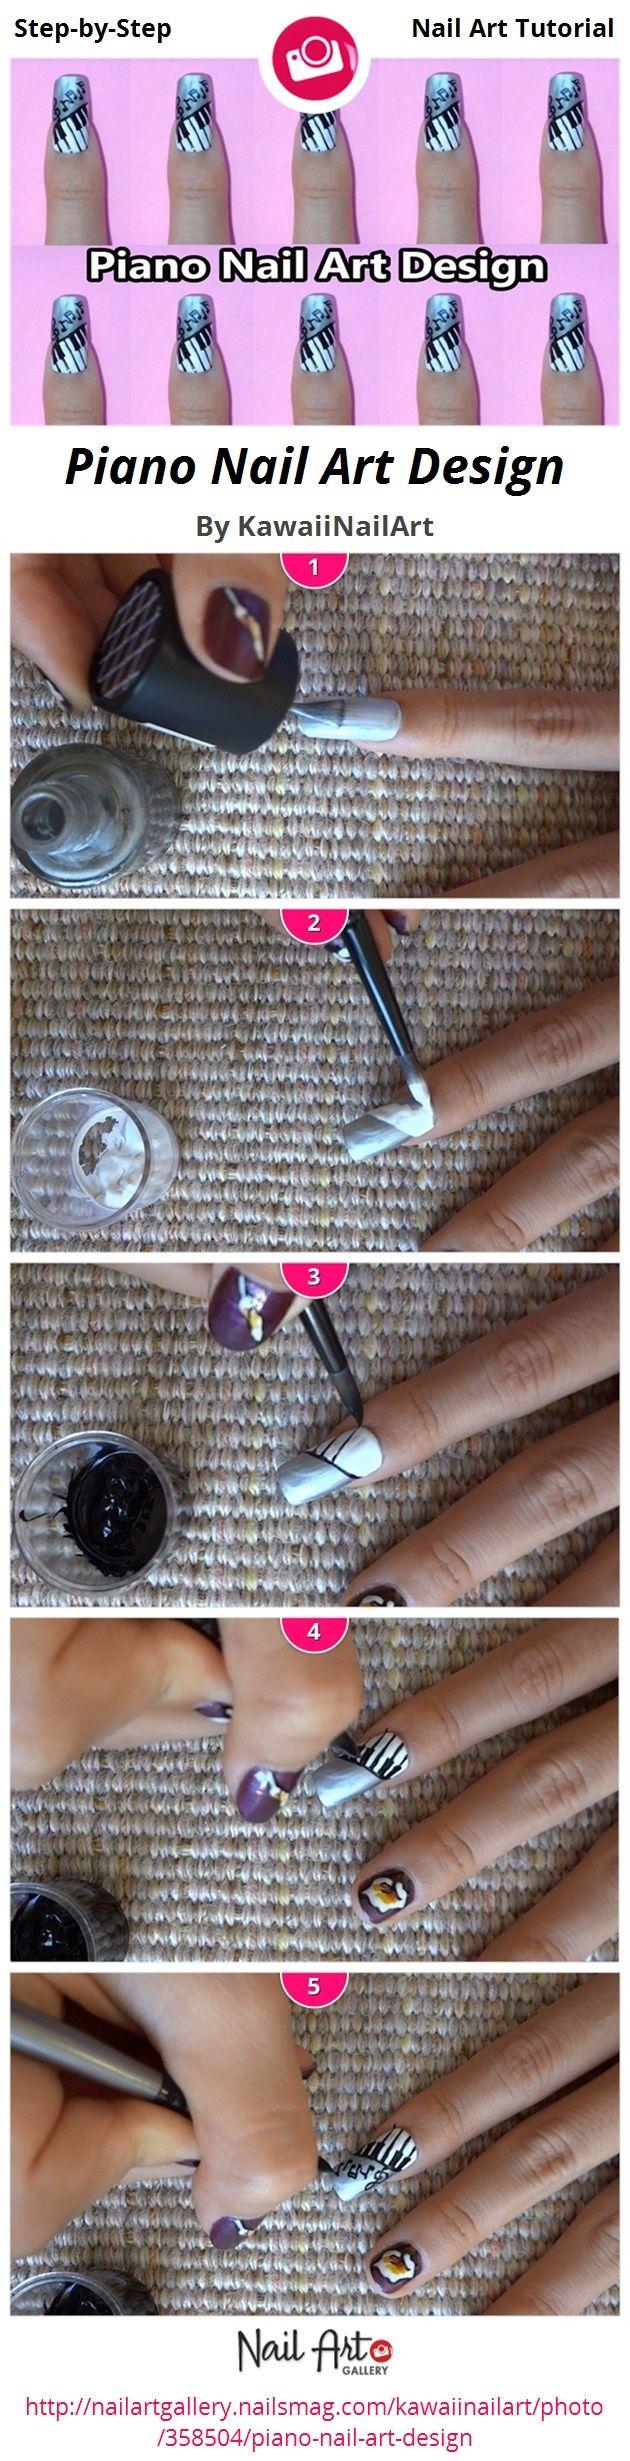 Piano Nail Art Design - Nail Art Gallery Step-by-Step Tutorial Photos